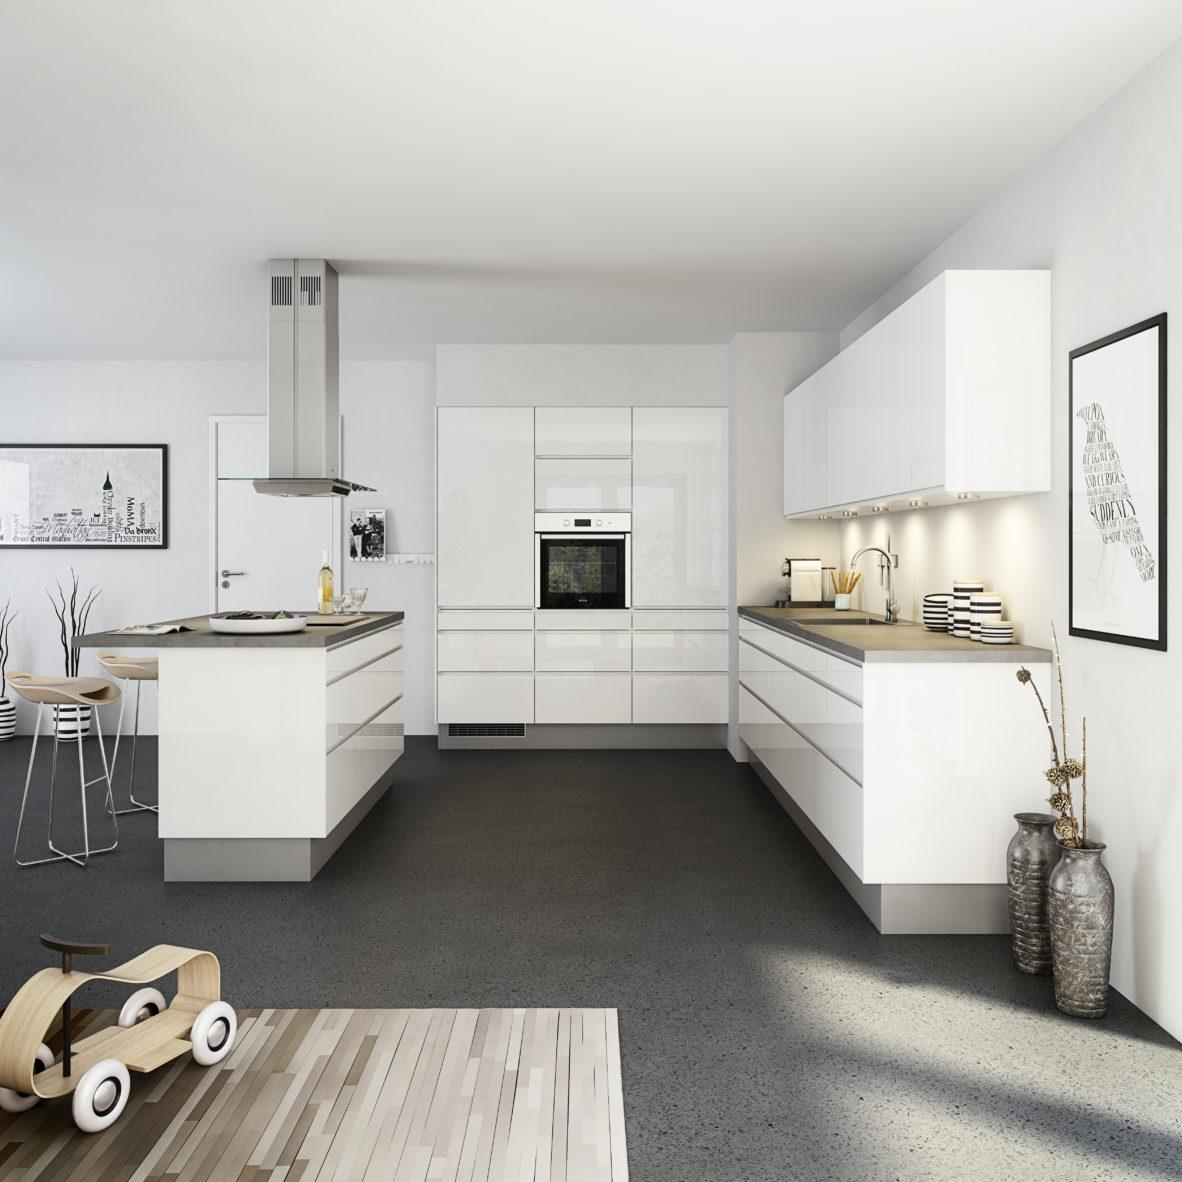 20 - opdateret - køkken venezia højglans